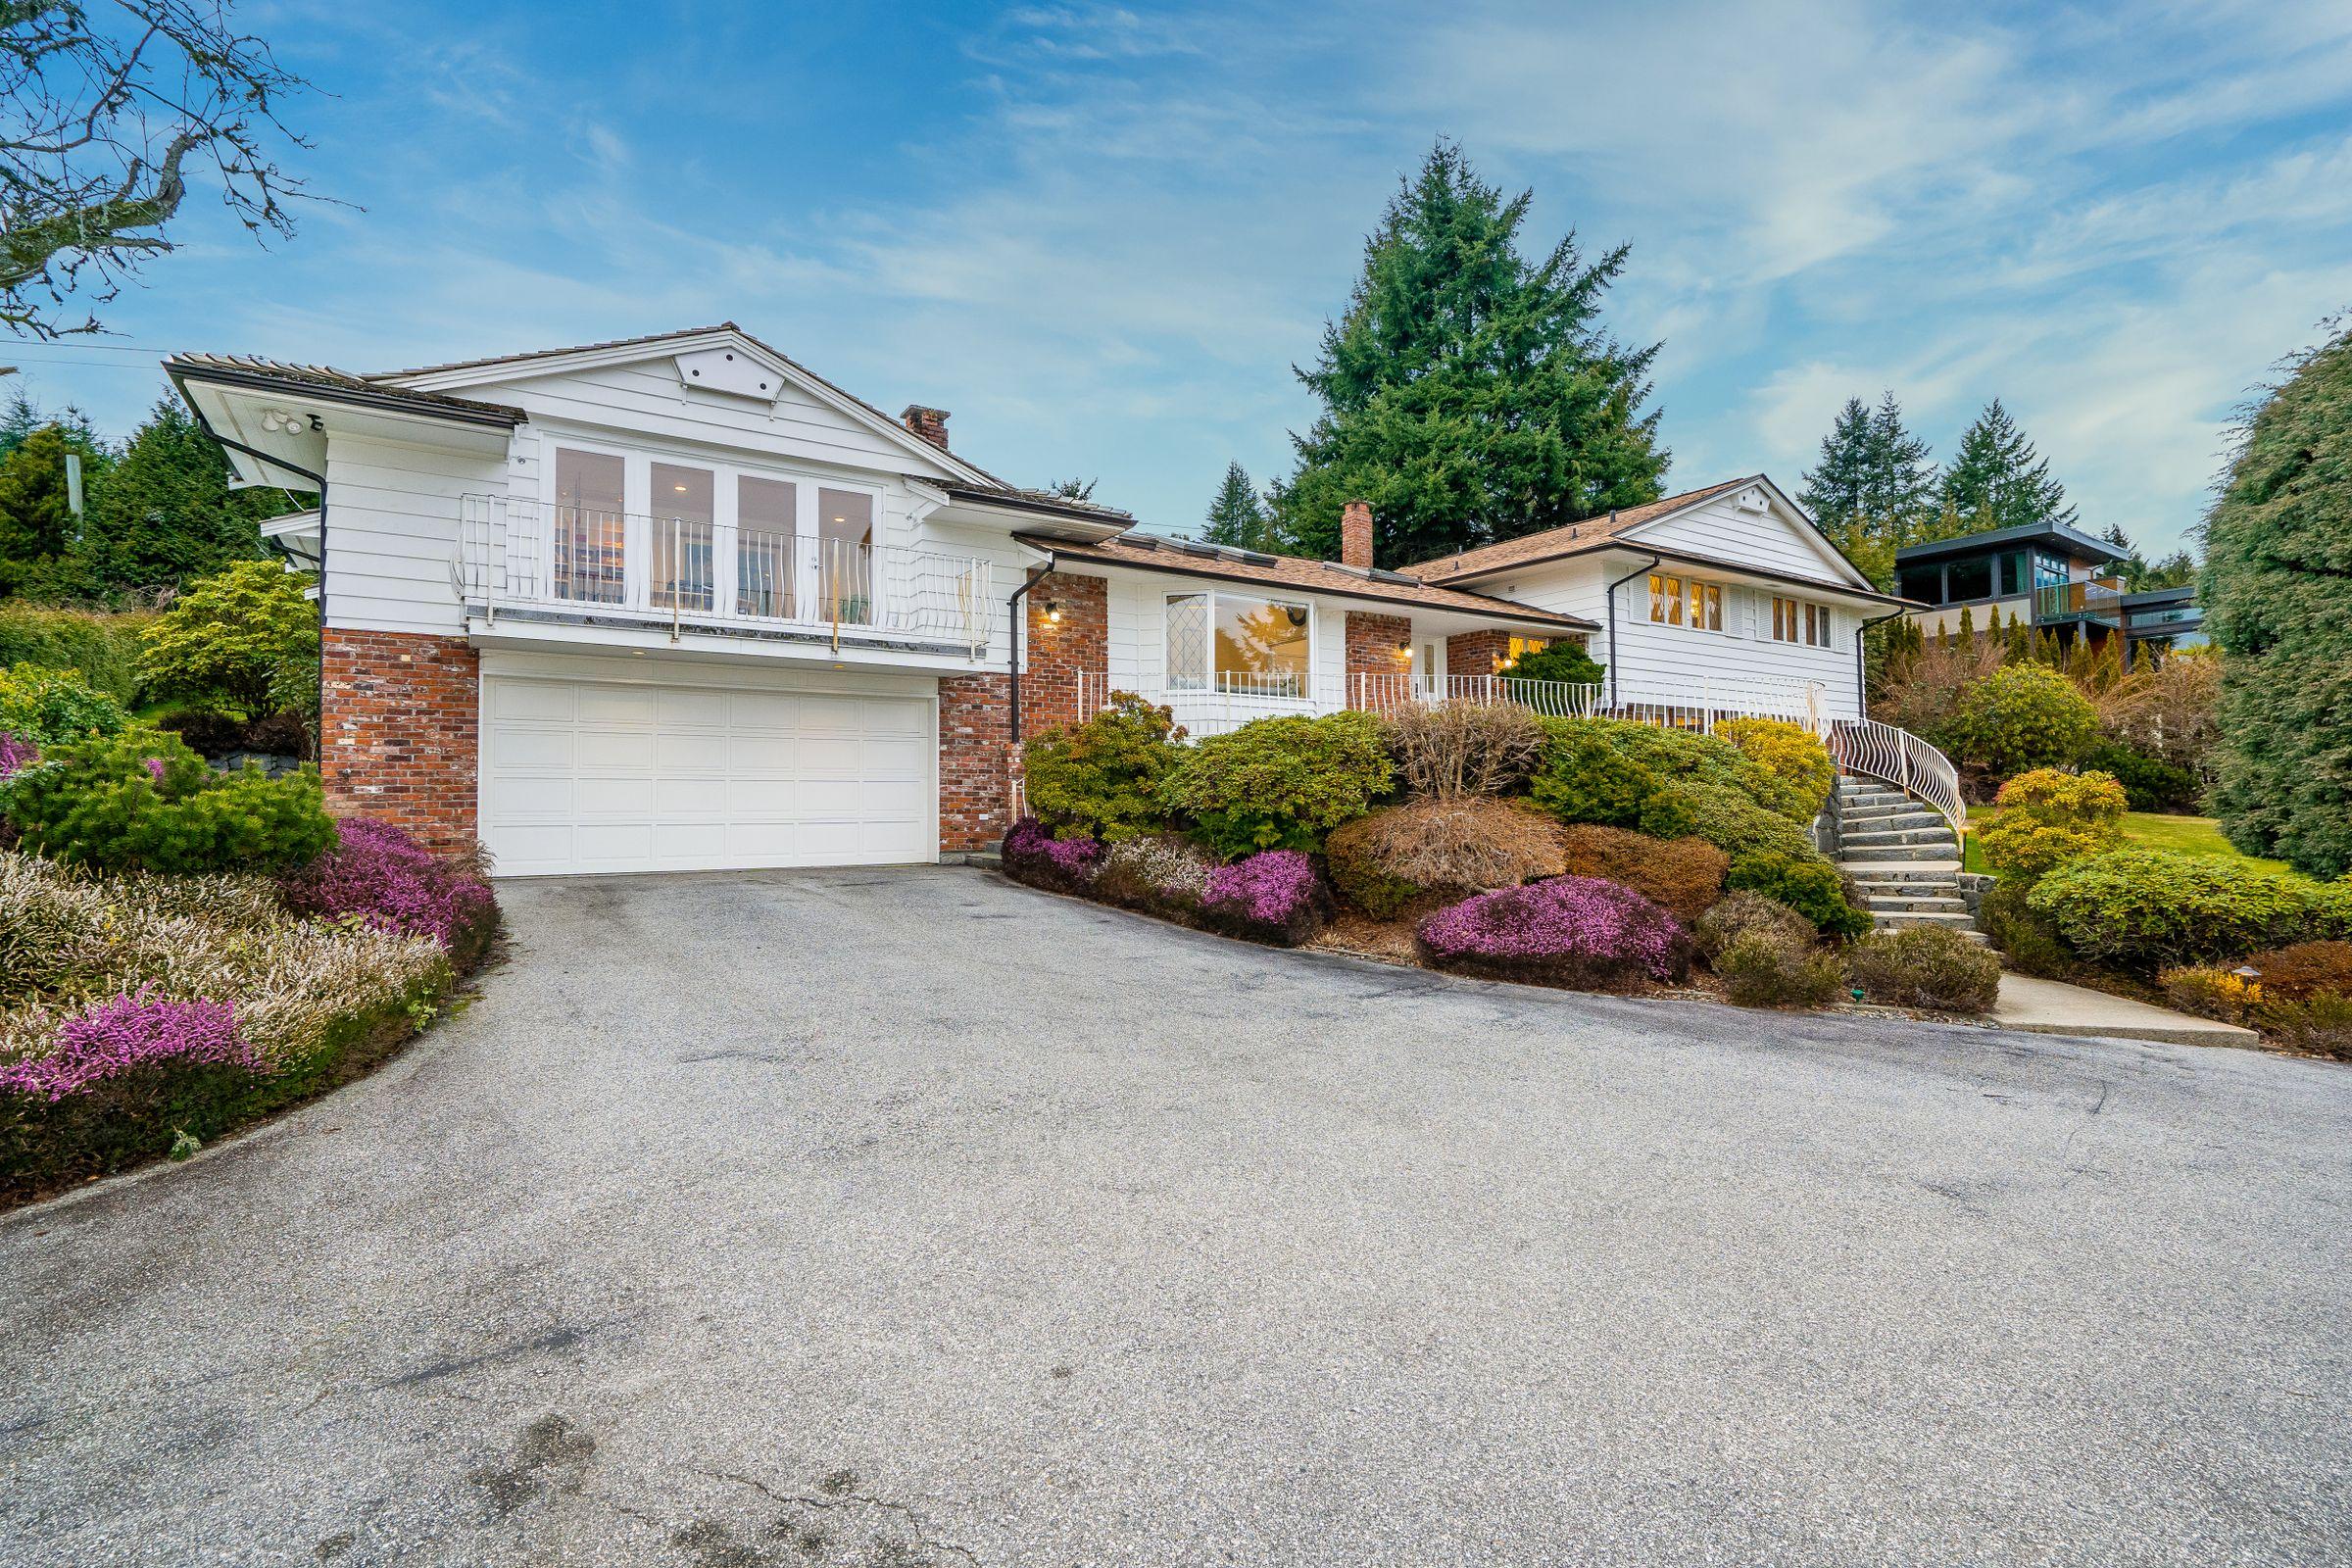 685 King Georges Way, British Properties, West Vancouver